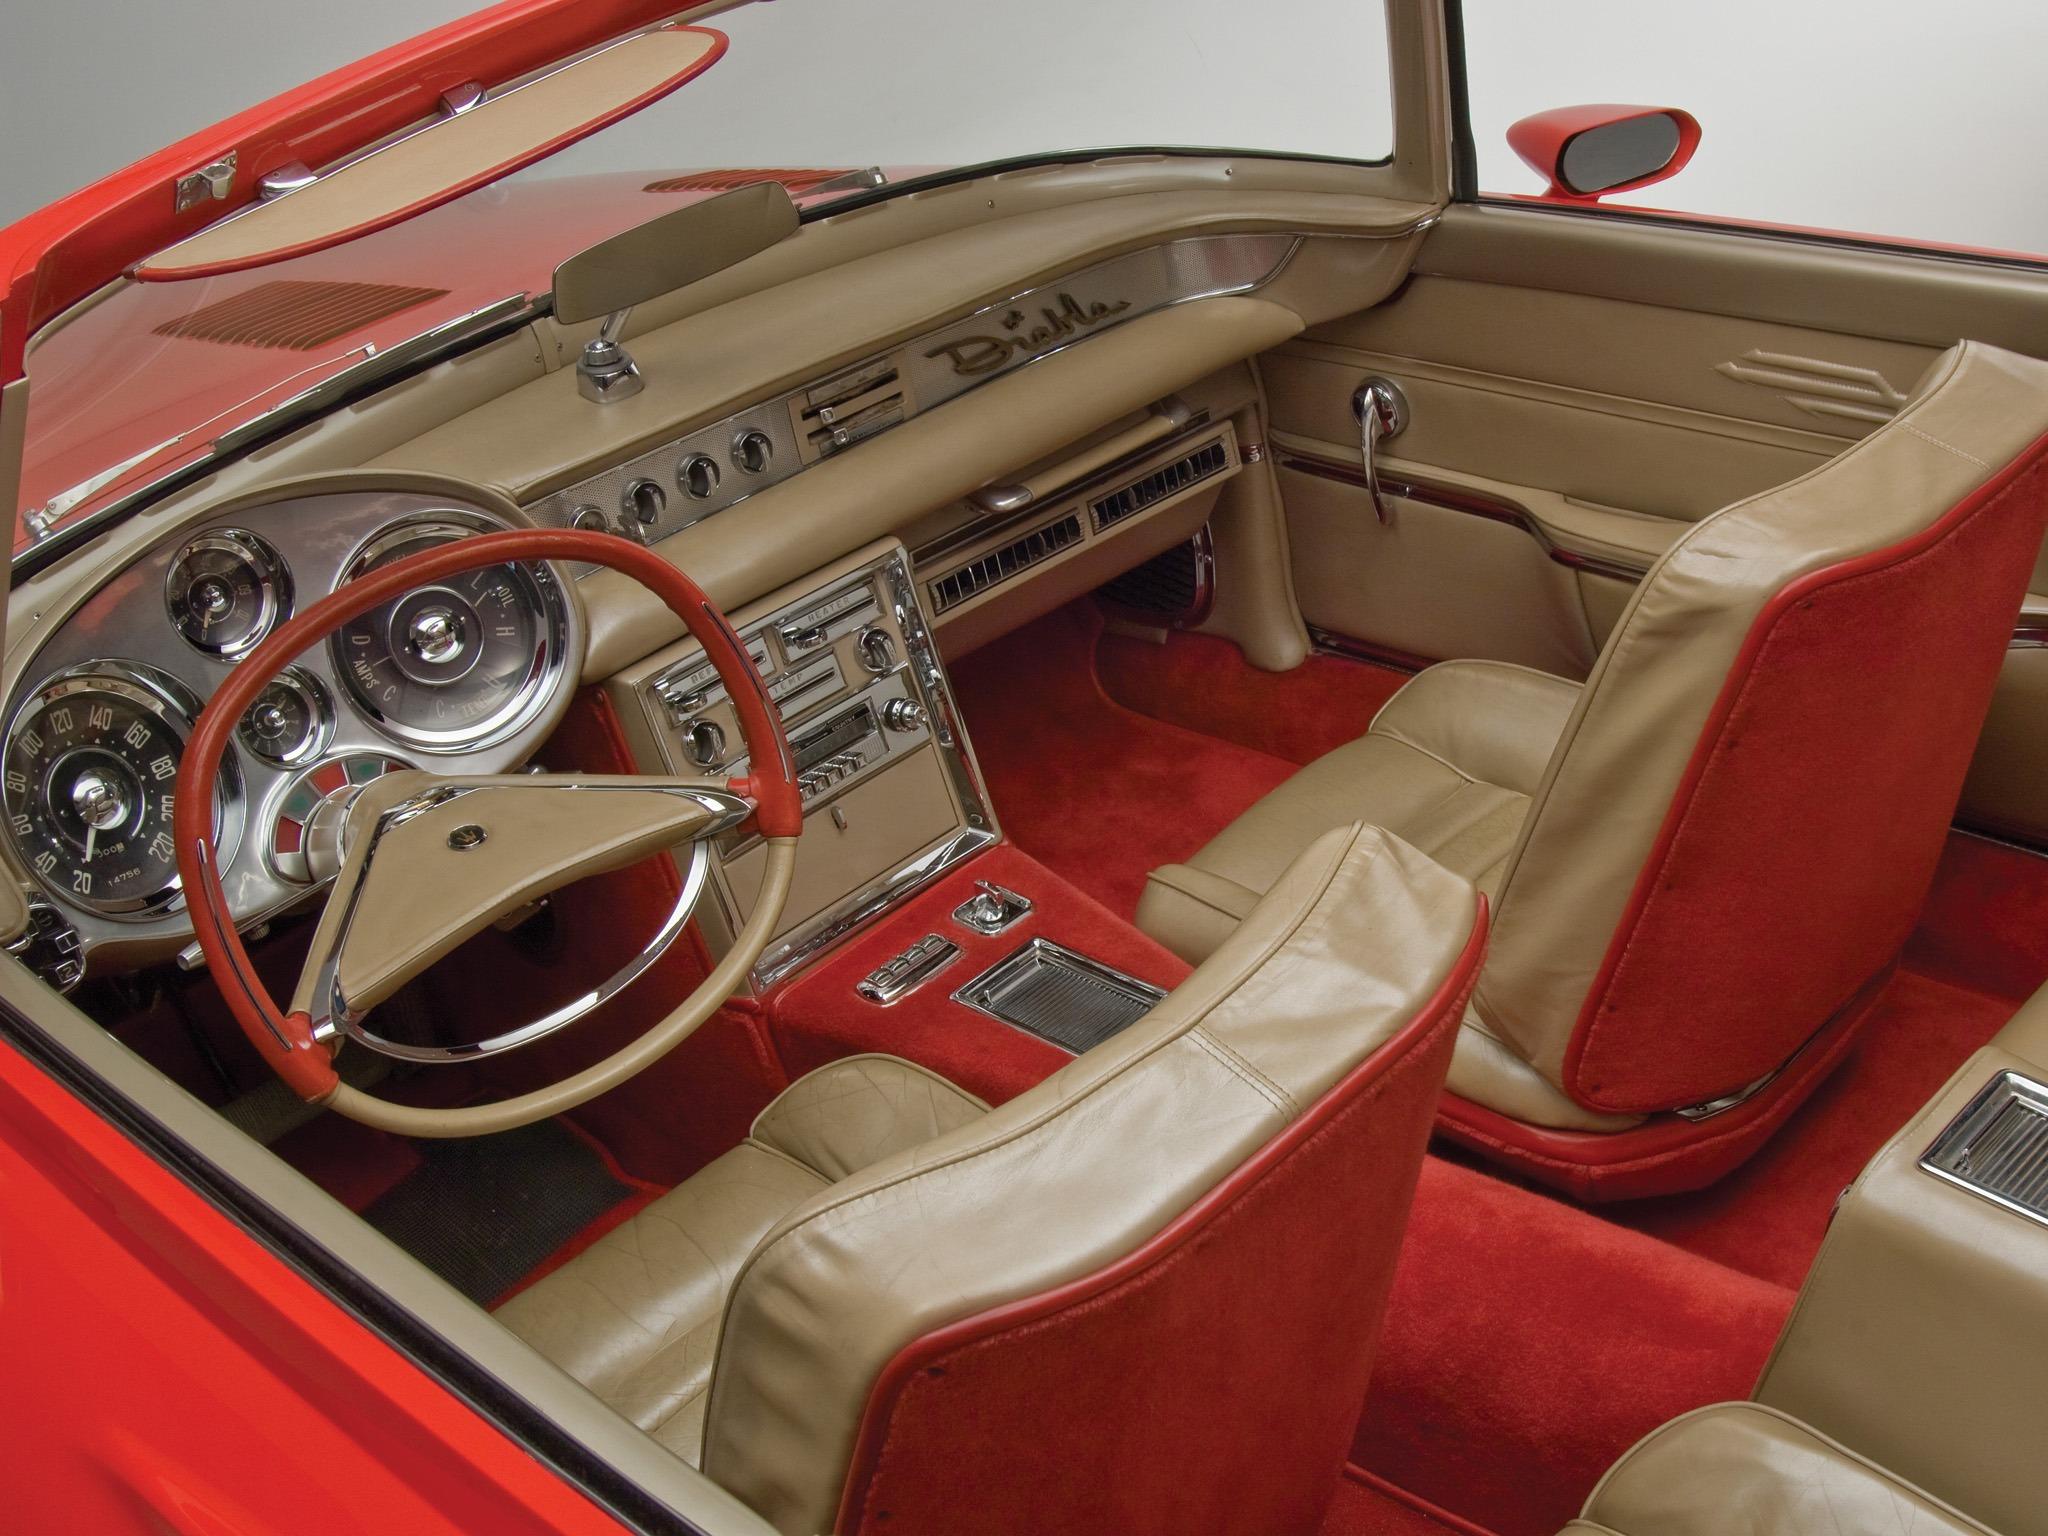 Chrysler Dealer Near Me >> Chrysler Diablo Concept Car (1957) - Old Concept Cars